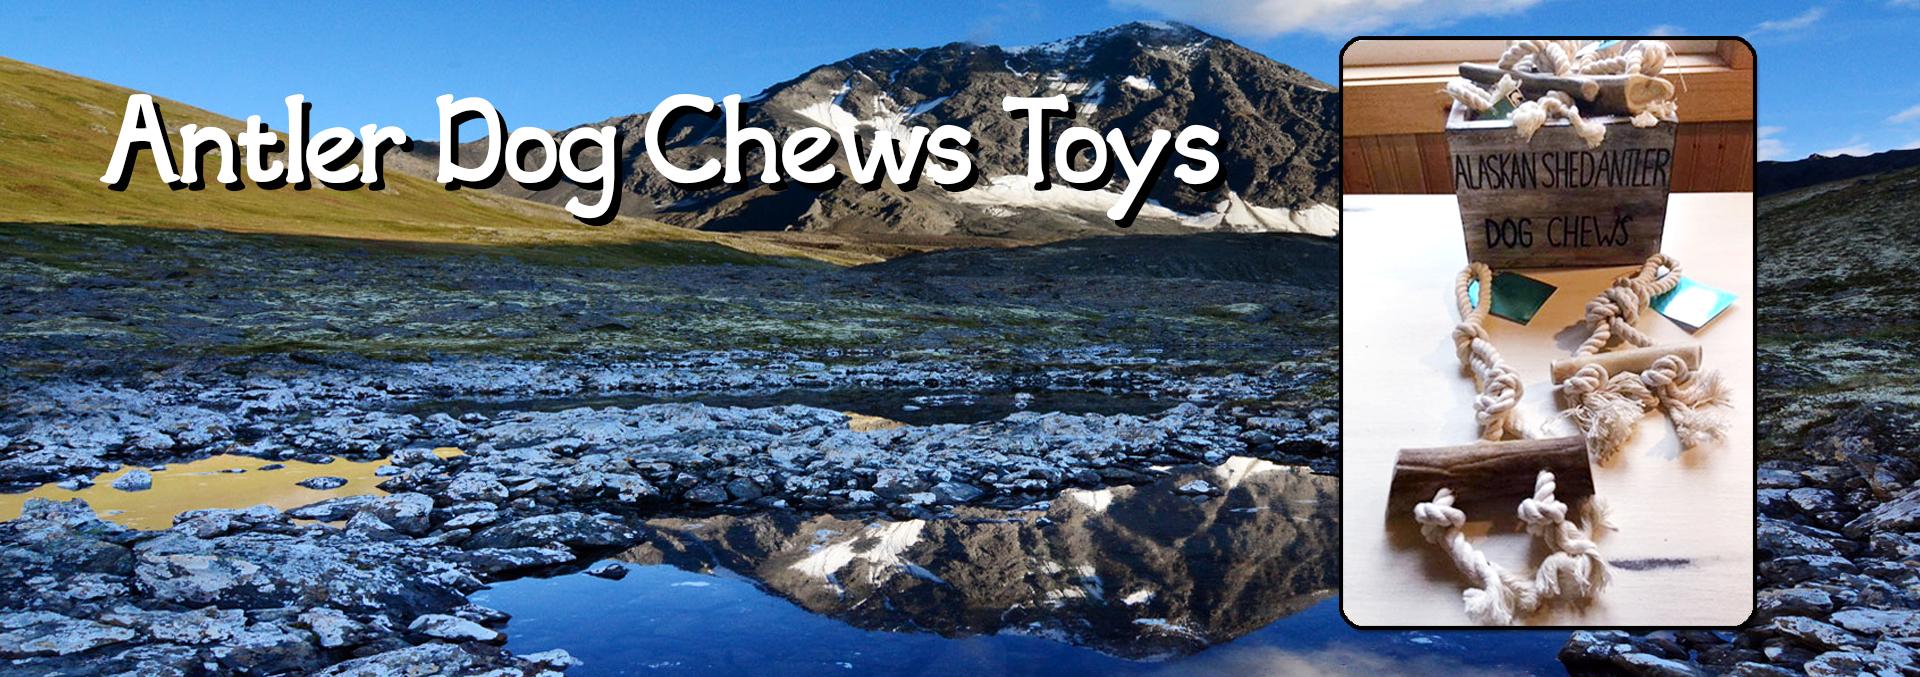 Antler Dog Chew Toys